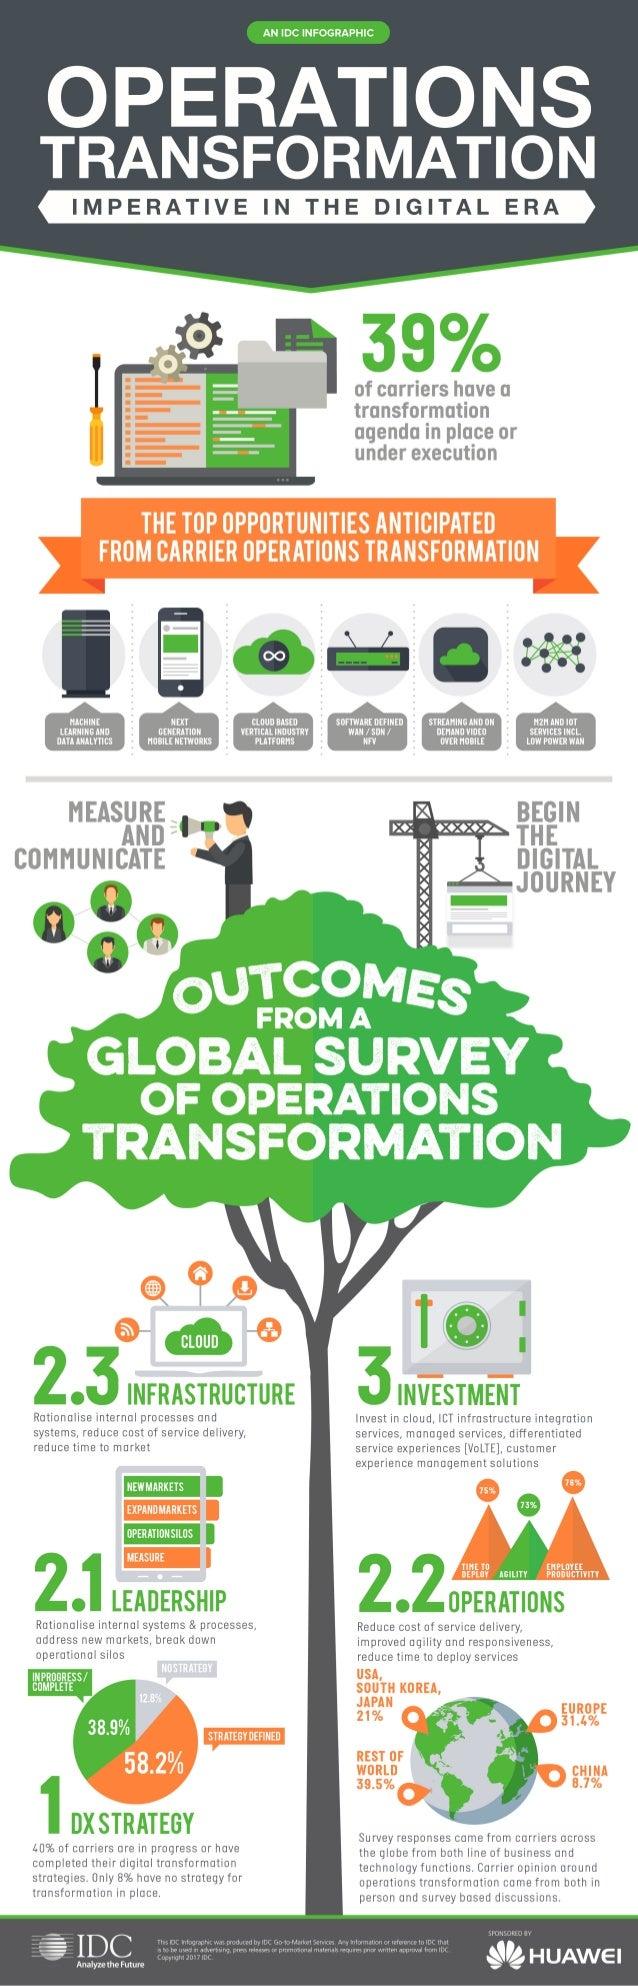 Operations transformation imperative in the digital era